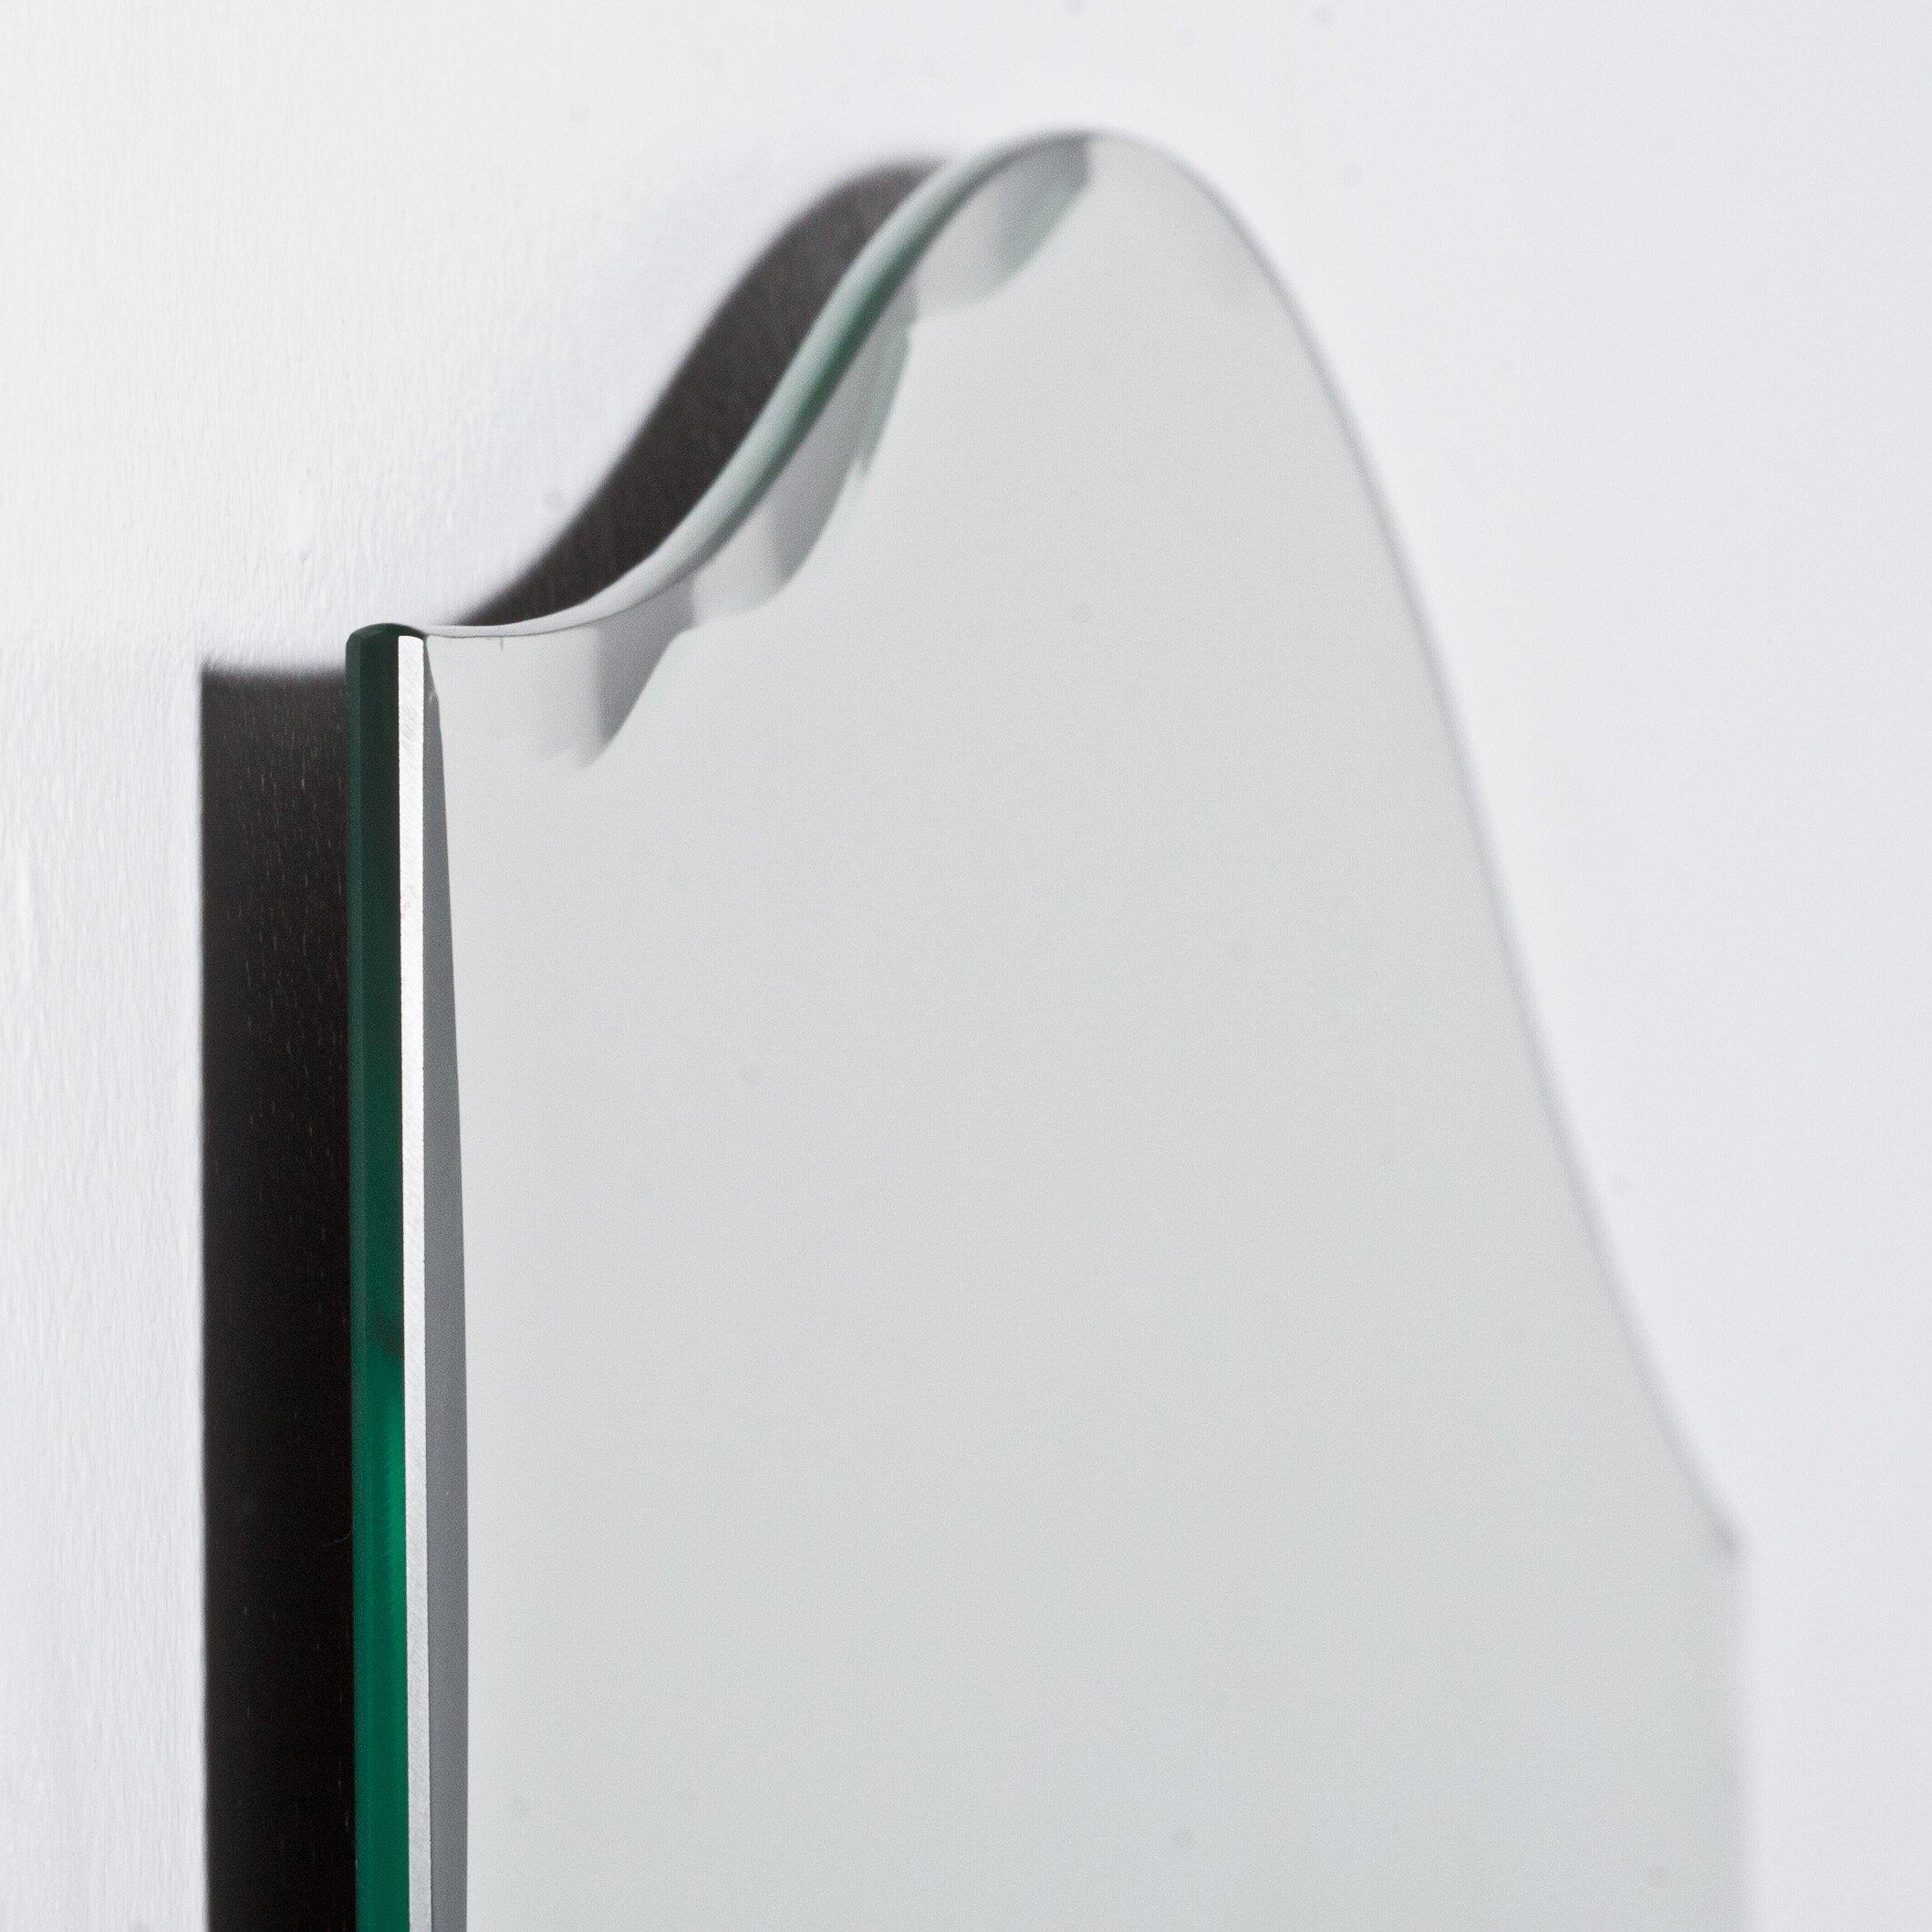 Decor wonderland allison modern wall mirror reviews for Modern wall mirror